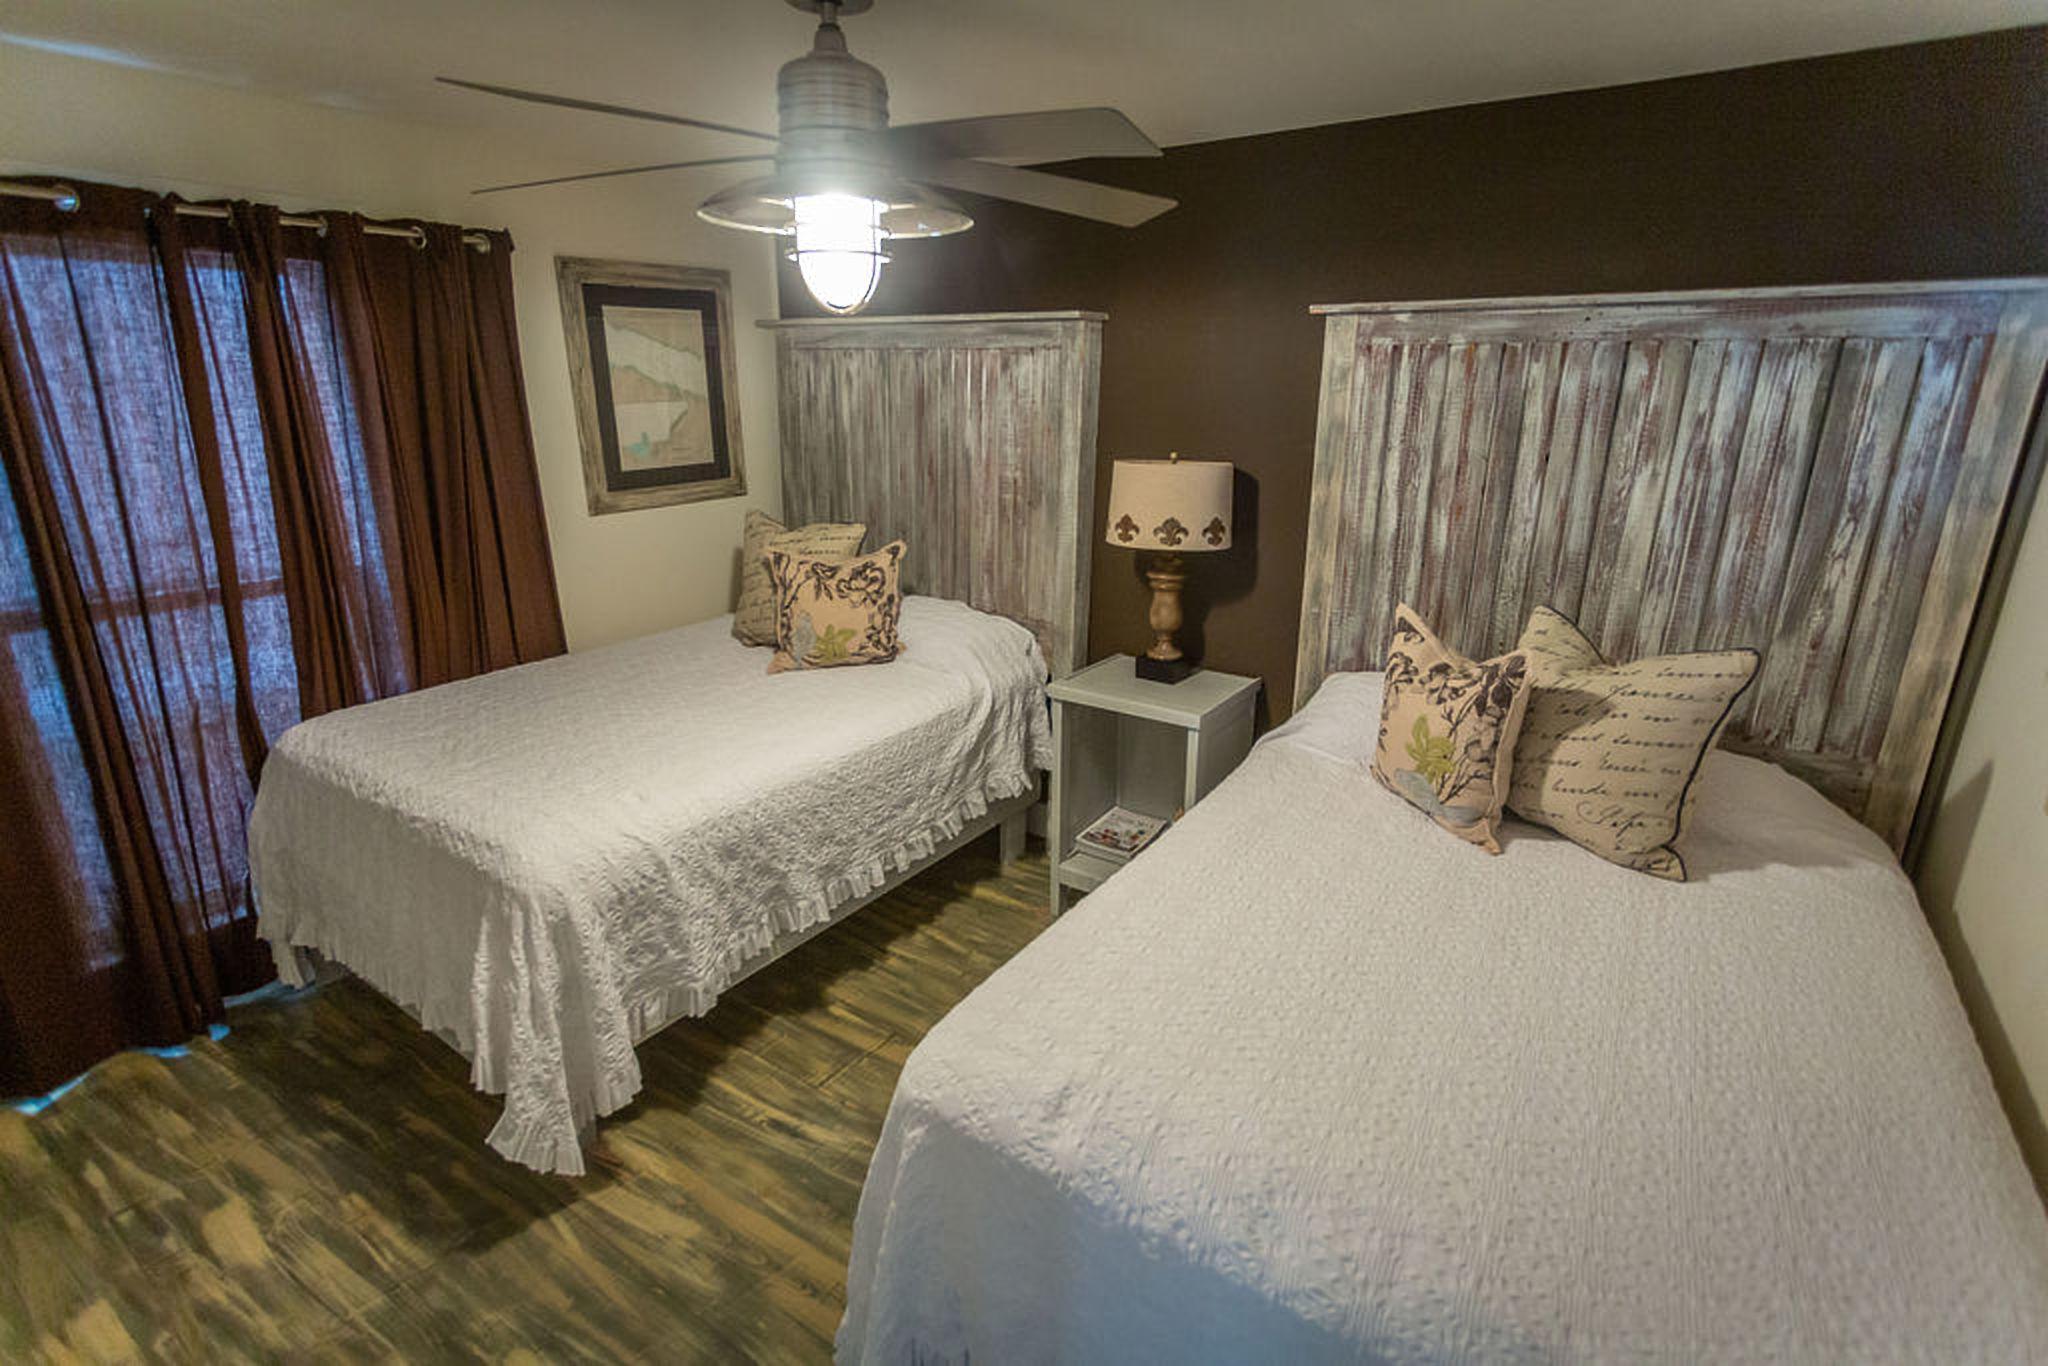 Bedroom #5 - two queen beds/ share bath with bedroom #4